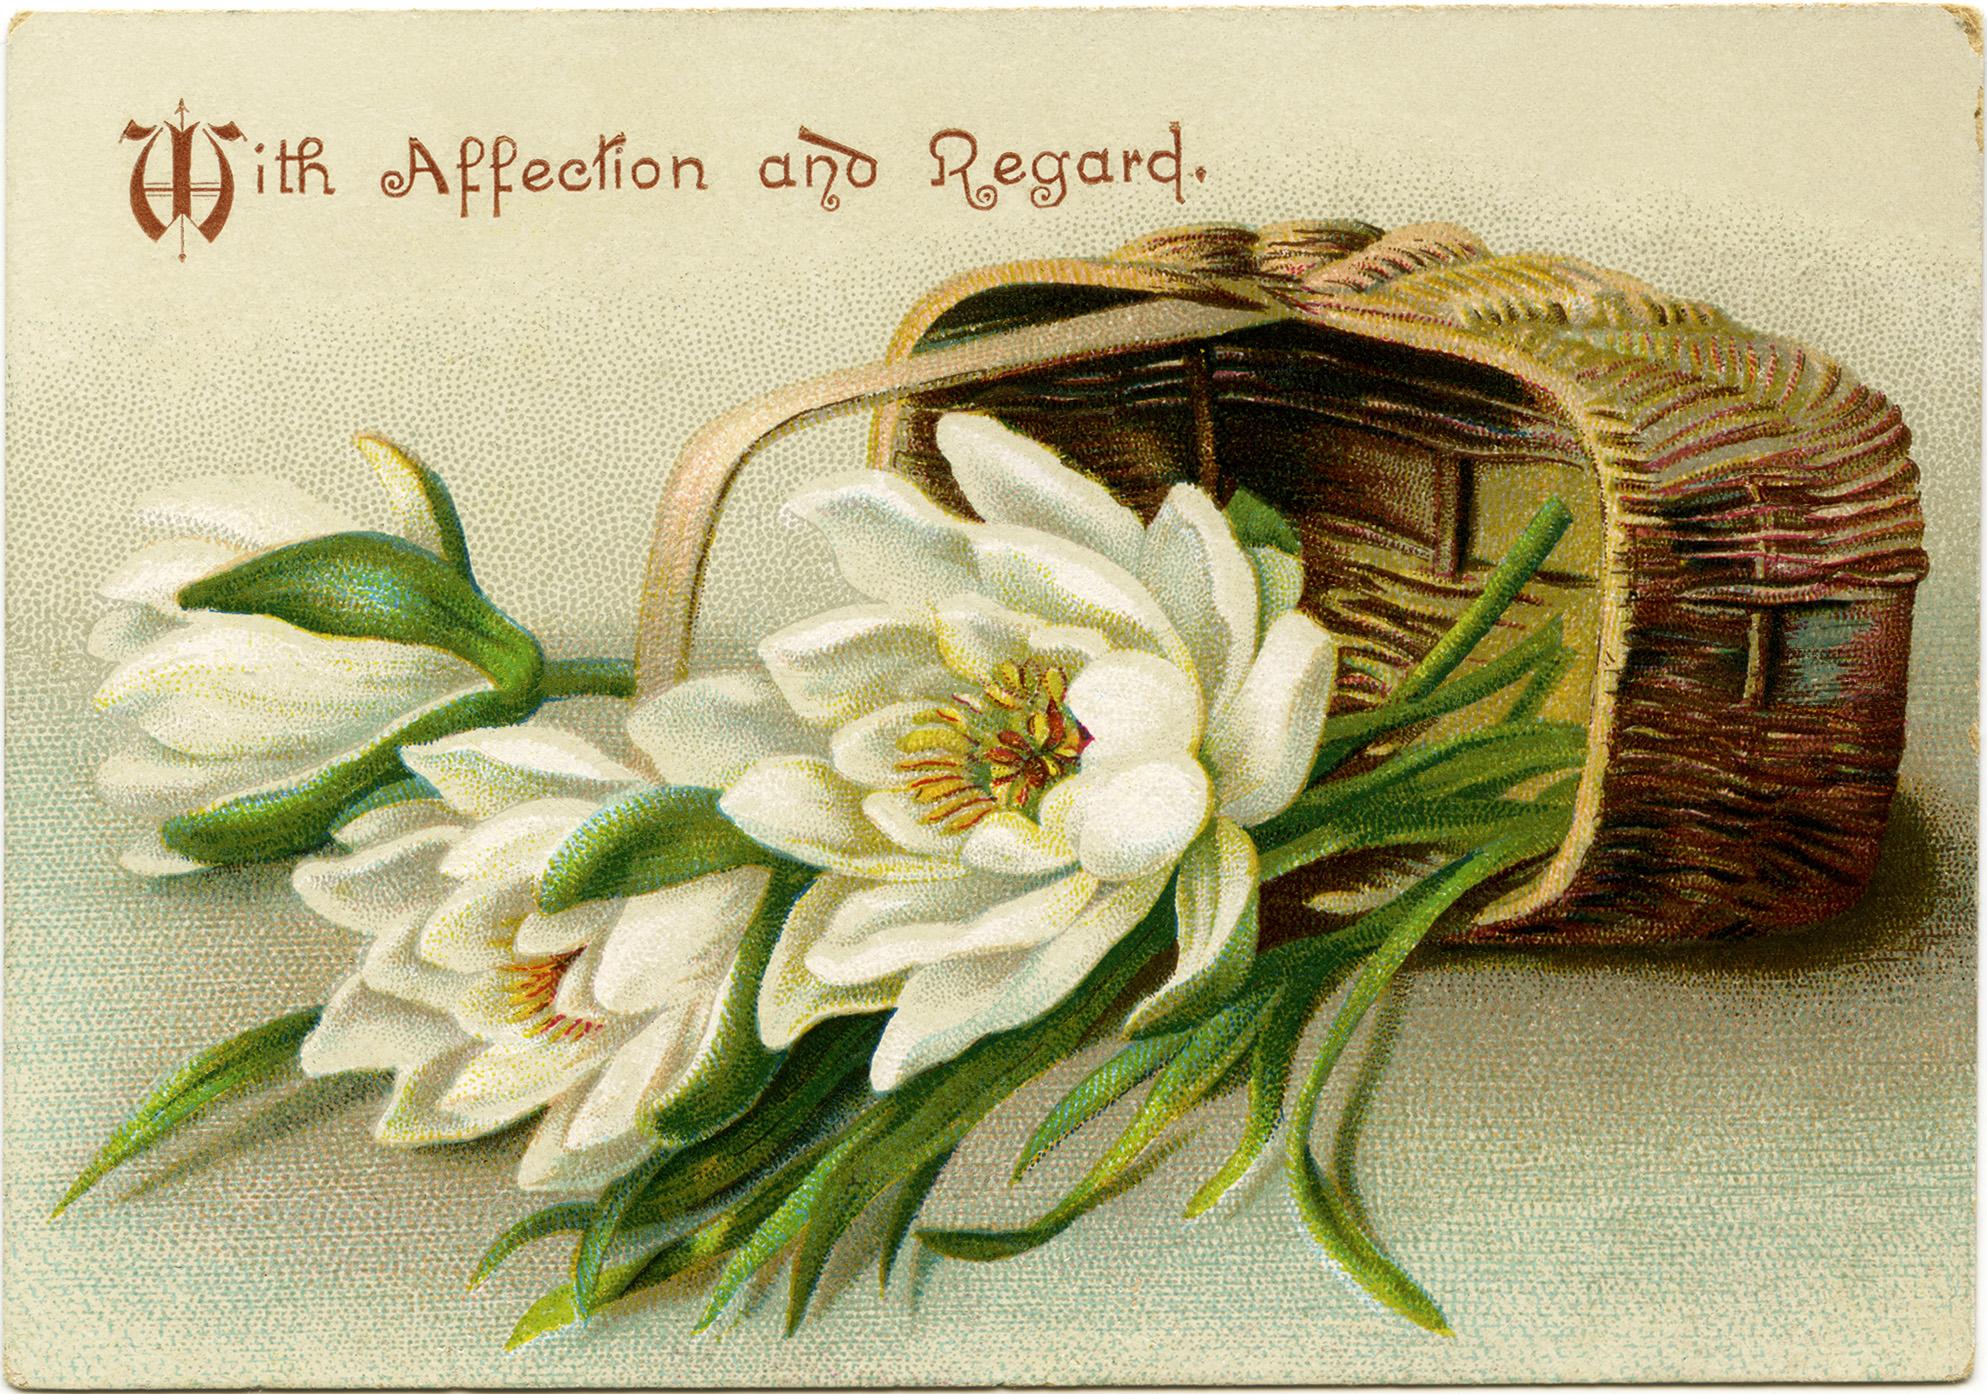 Basket of Flowers ~ Free Vintage Image